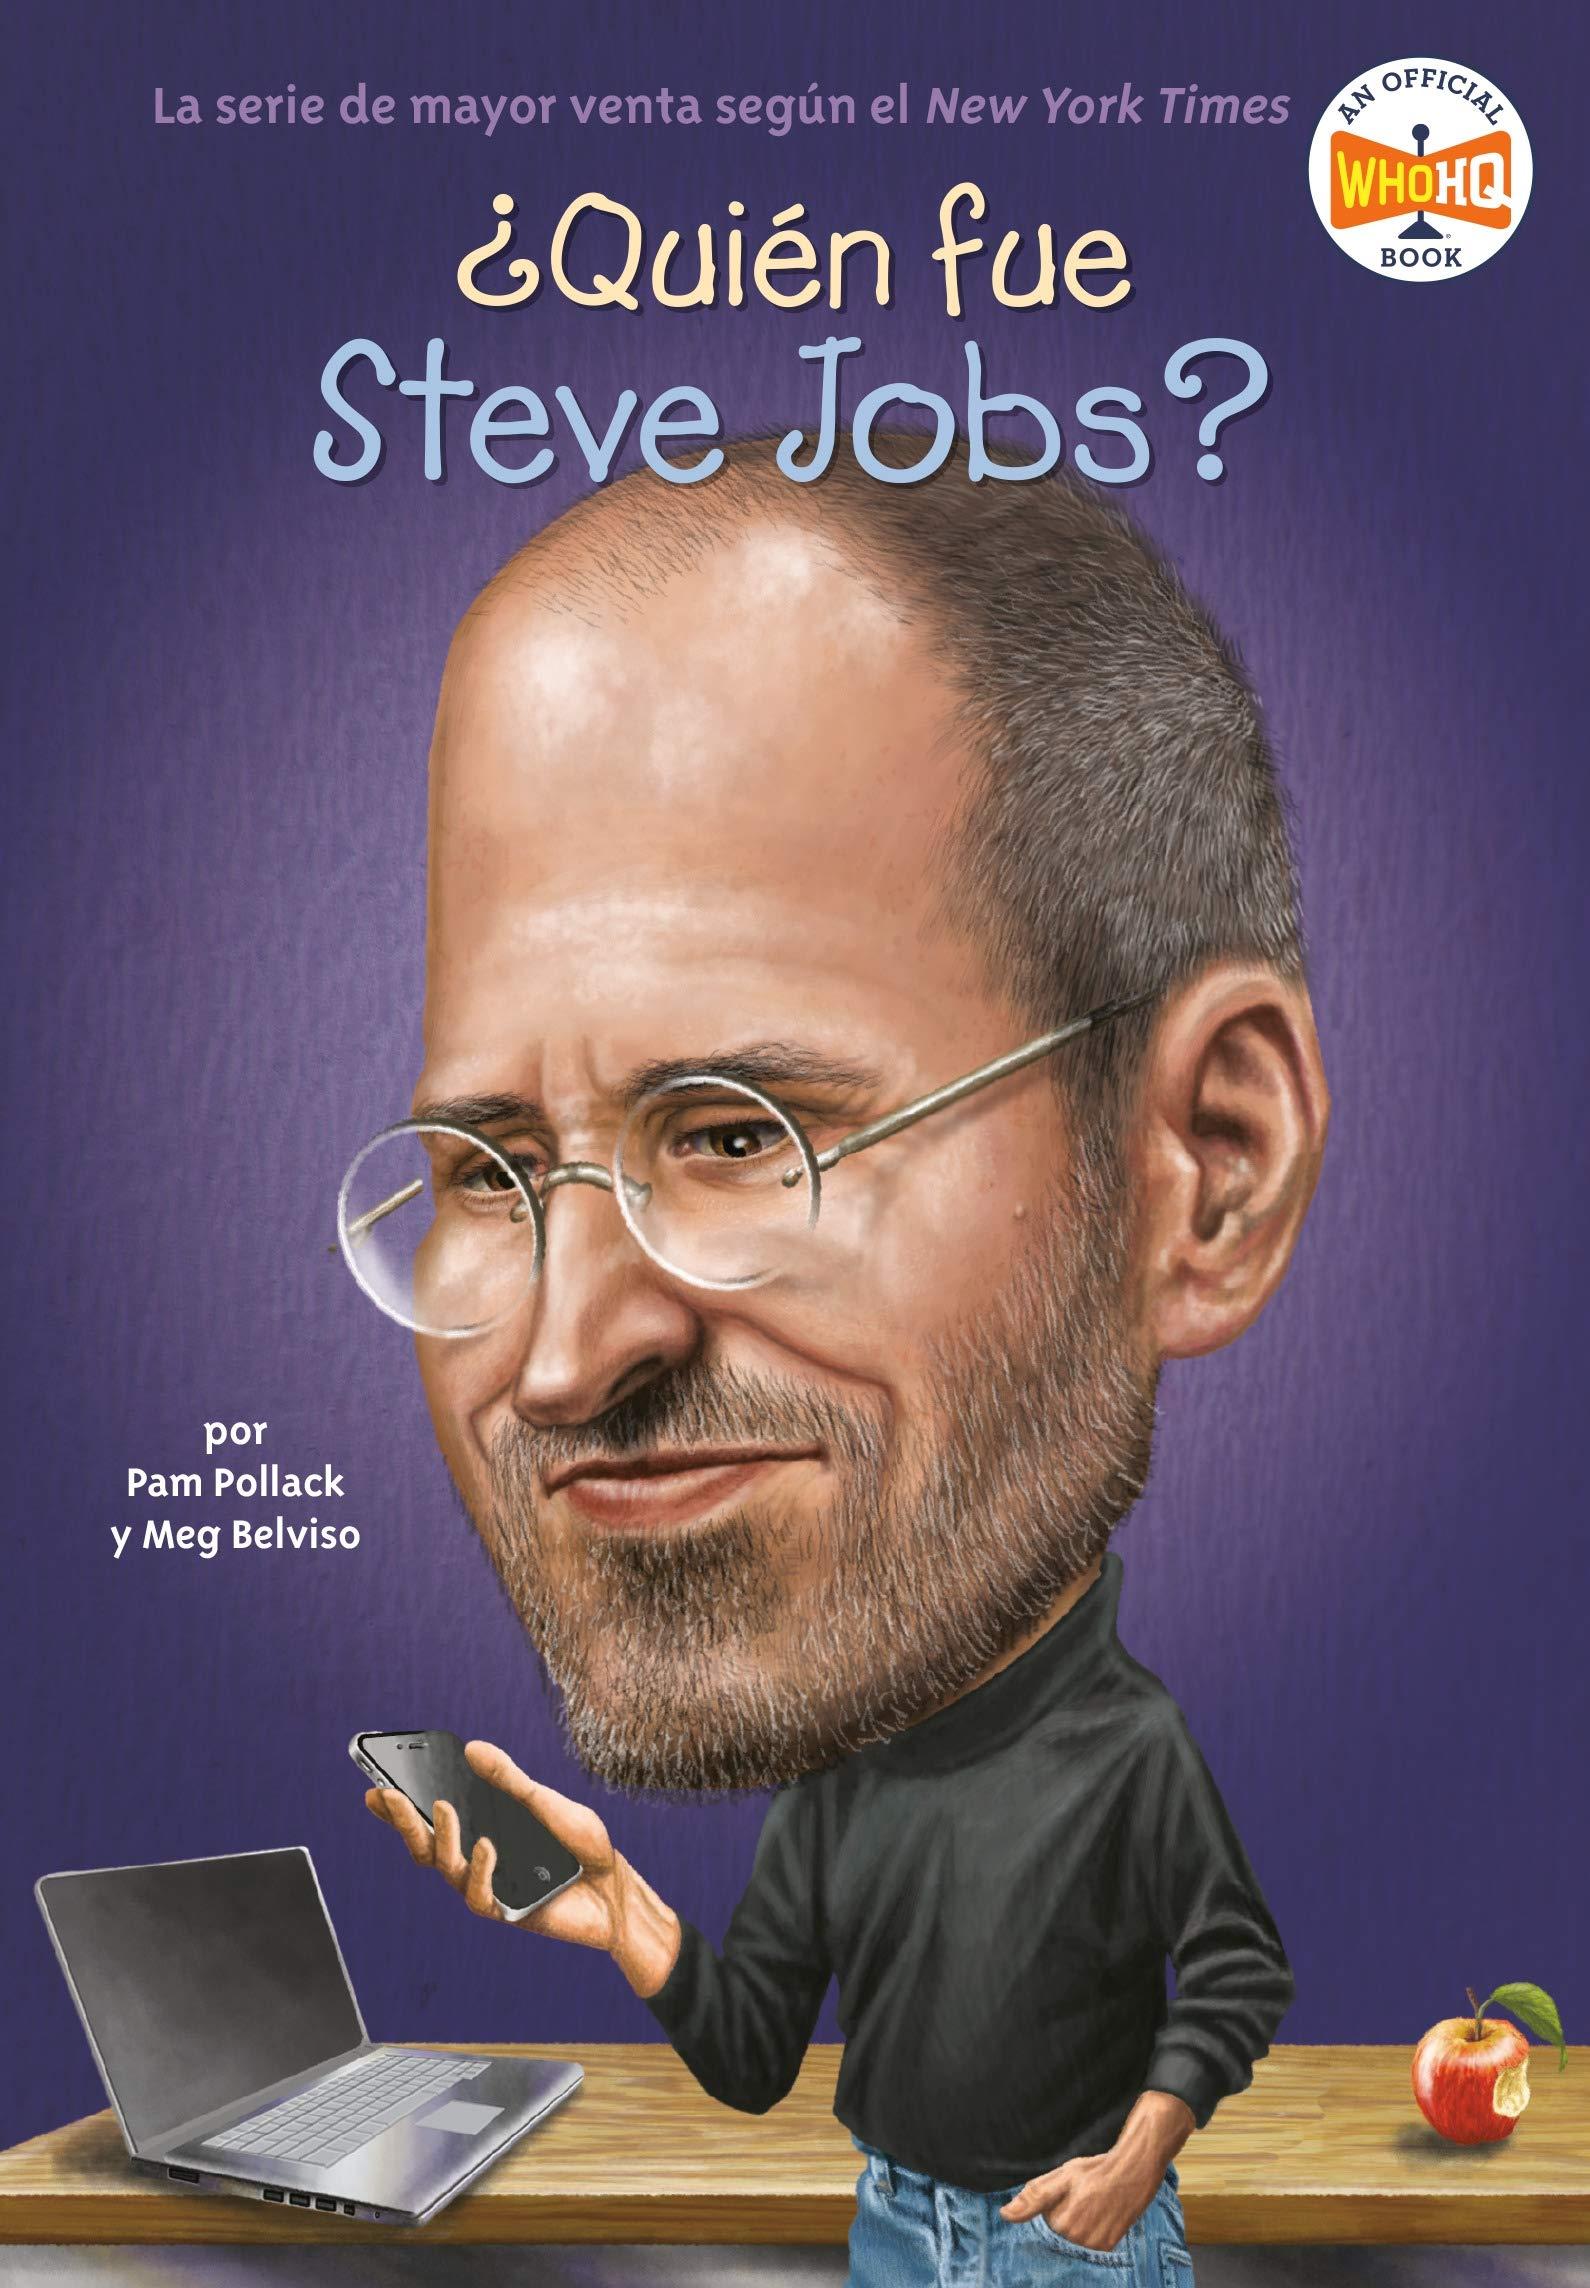 ¿Quién fue Steve Jobs? (Spanish Edition)